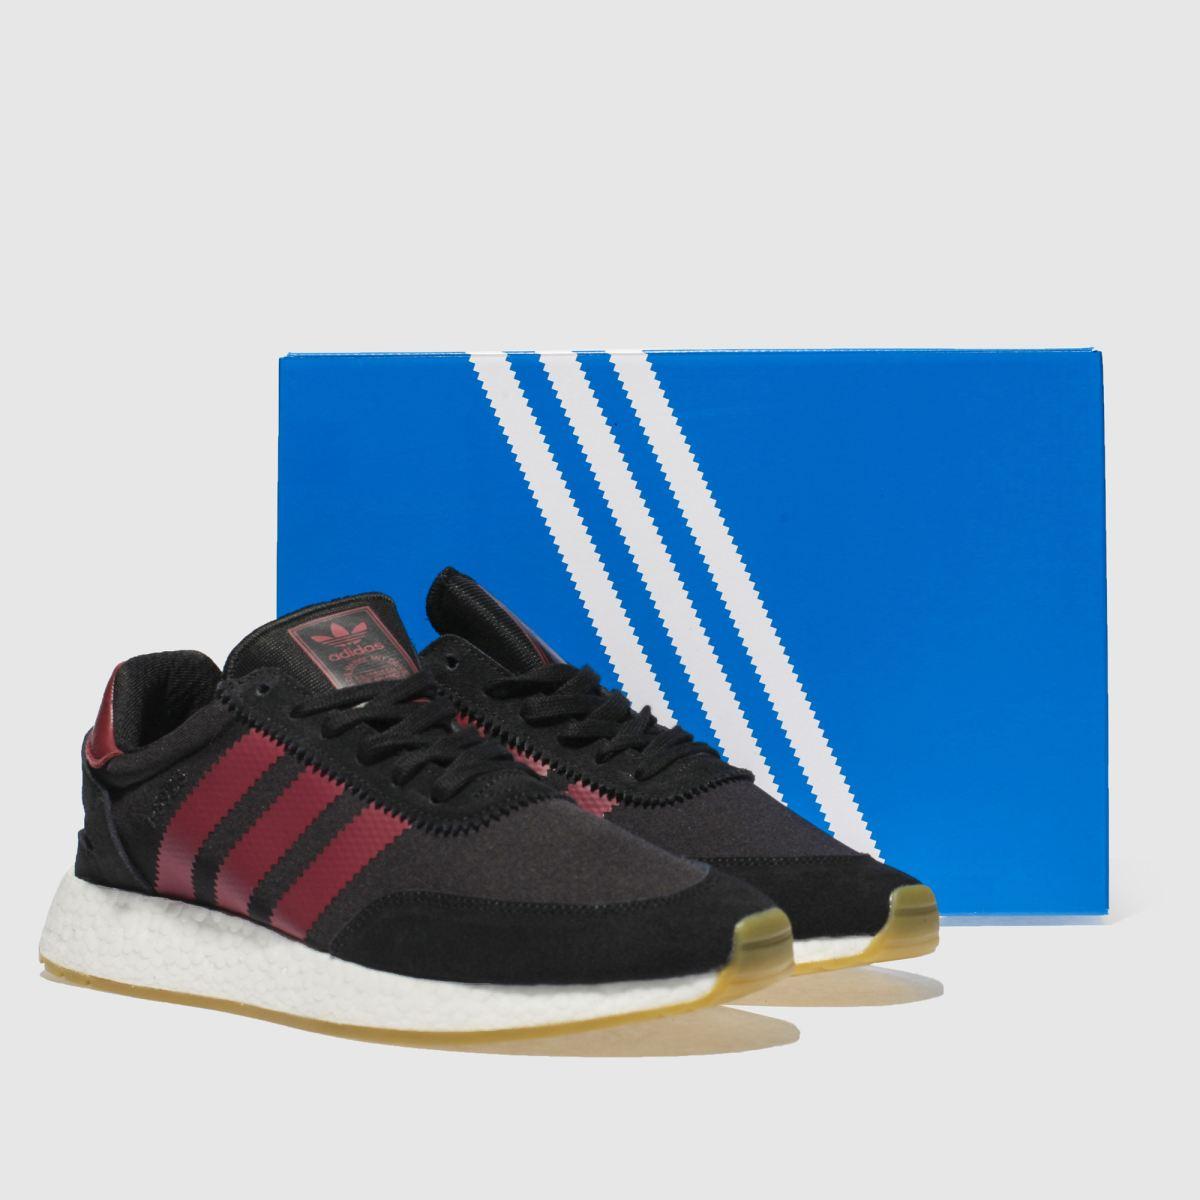 Schuh Adidas I 5923 SneakerGute Herren Rot Schwarz vf6YIb7yg